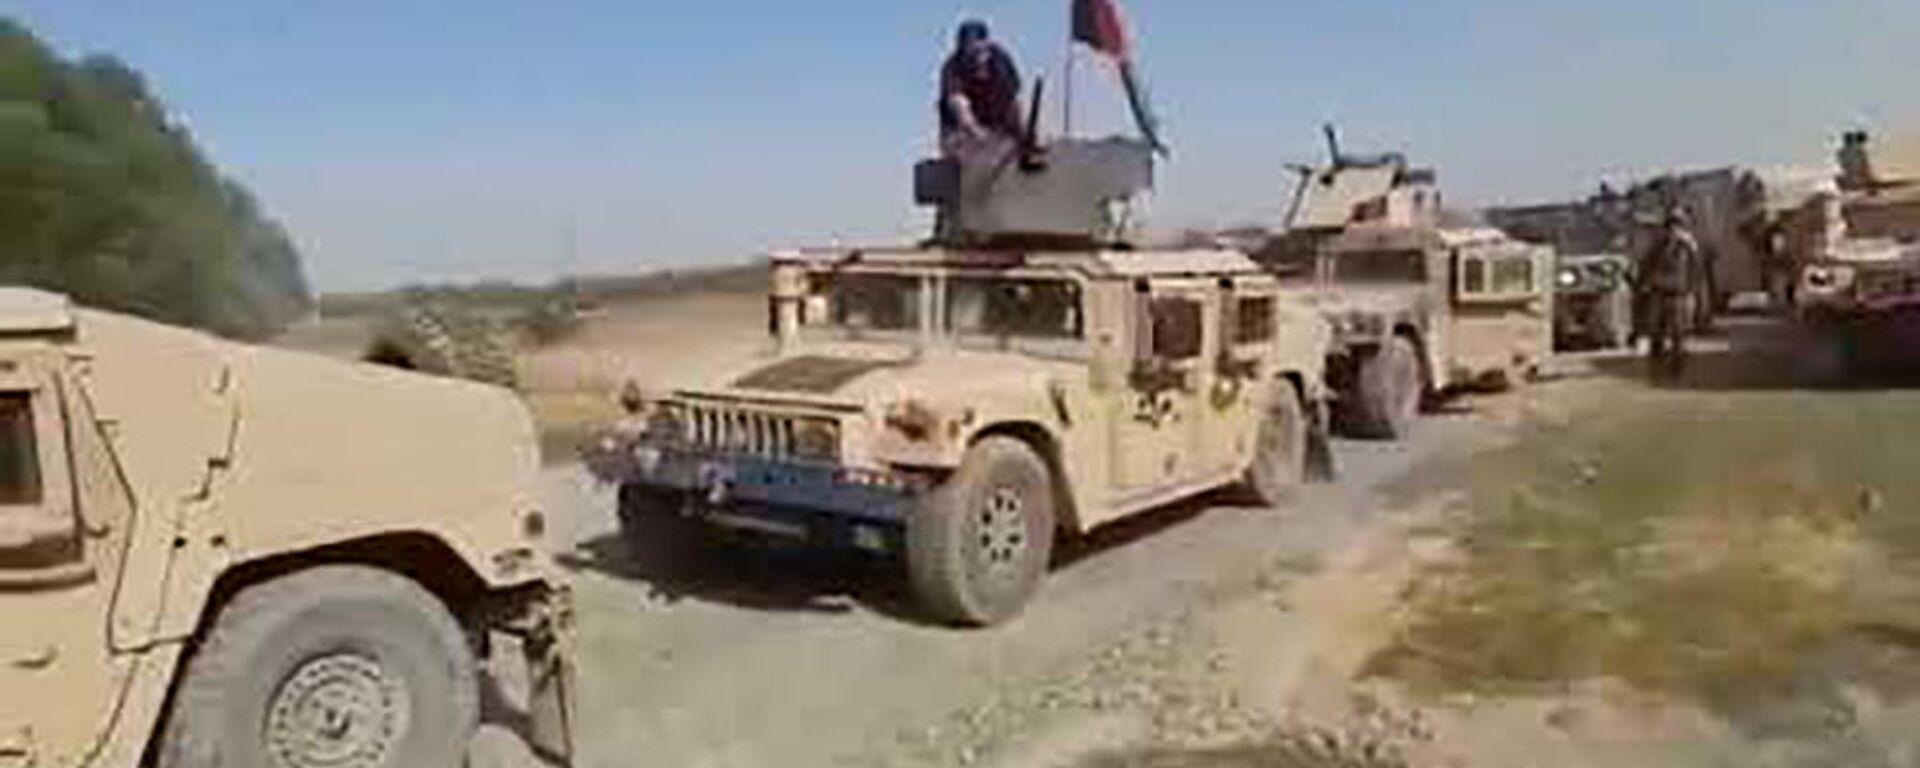 Талибы вышли к границам Таджикистана разгромив армию Афганистана - Sputnik Таджикистан, 1920, 25.06.2021